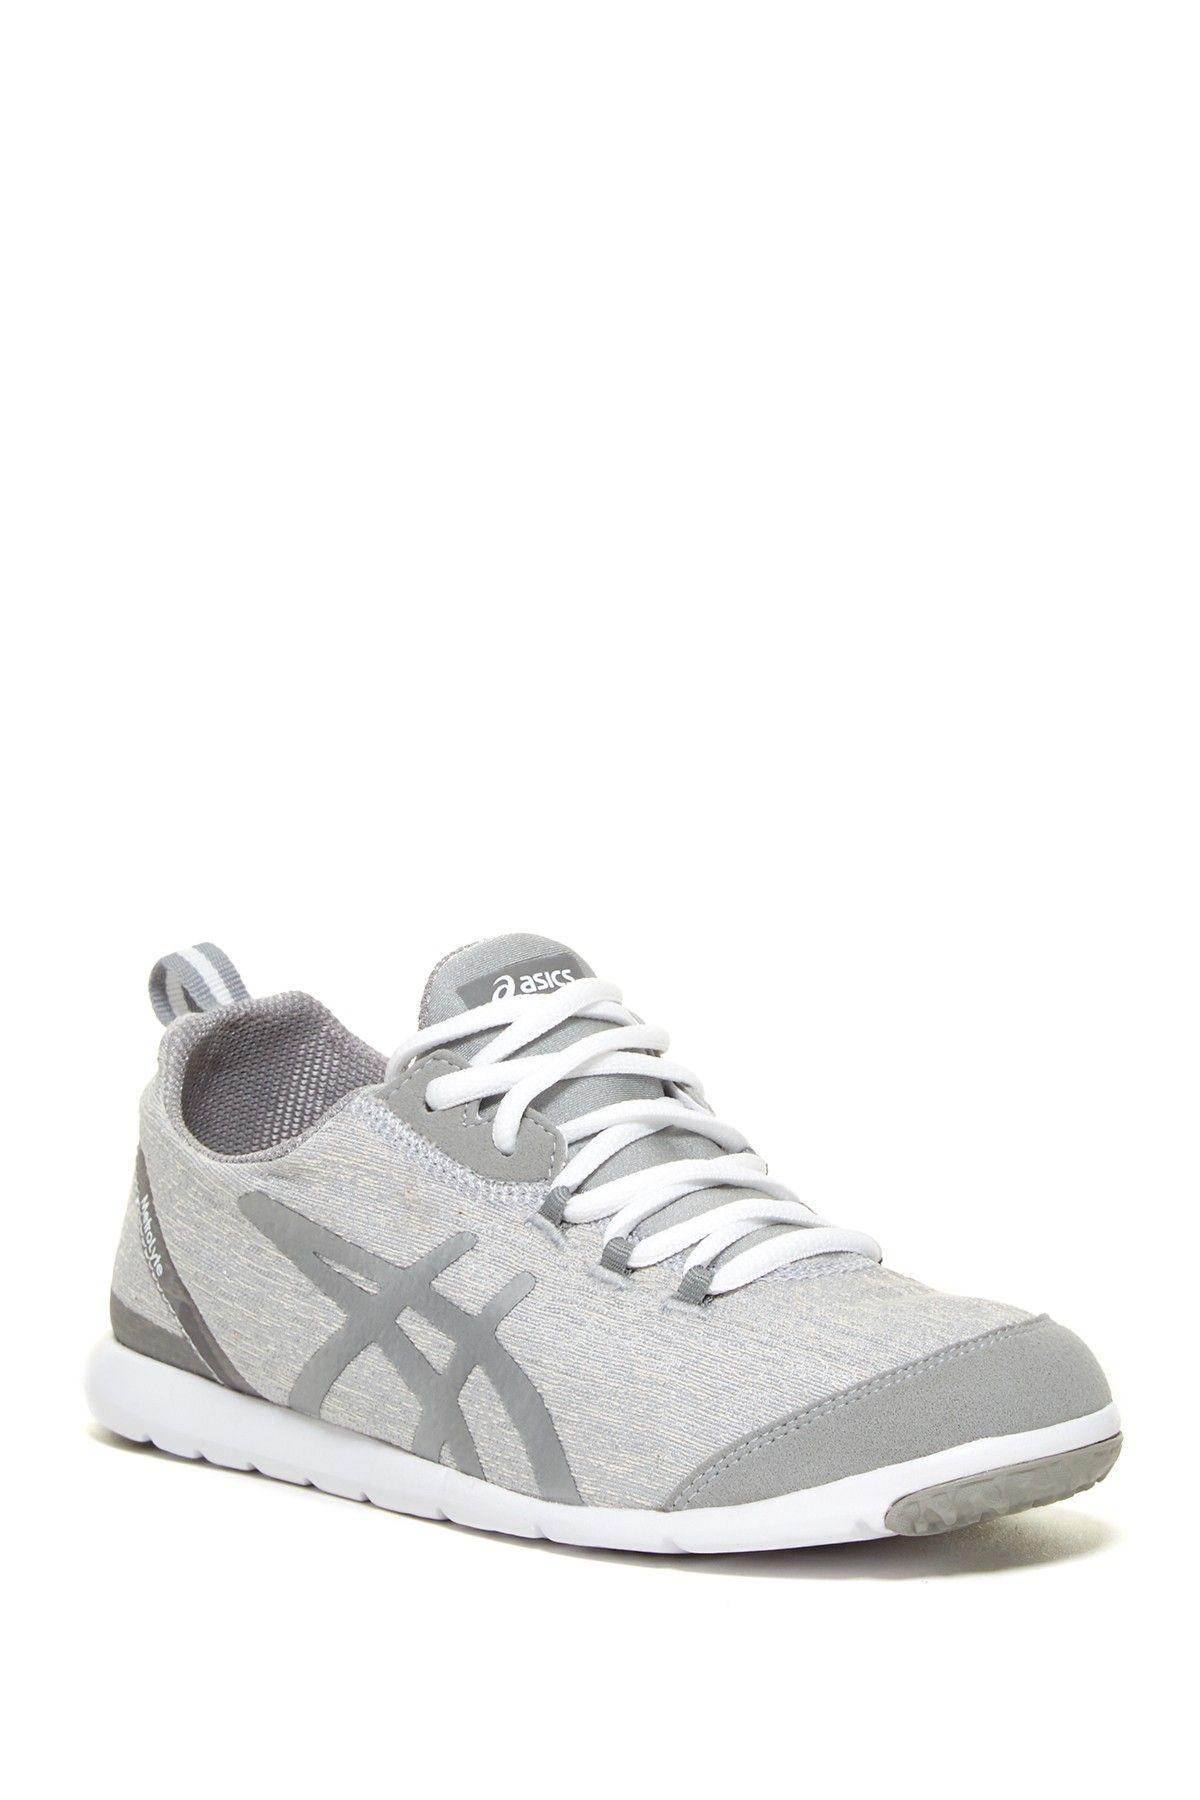 Sneaker 12554 marche Sneaker métrolyte métrolyte | 5a3b853 - resepmasakannusantara.website